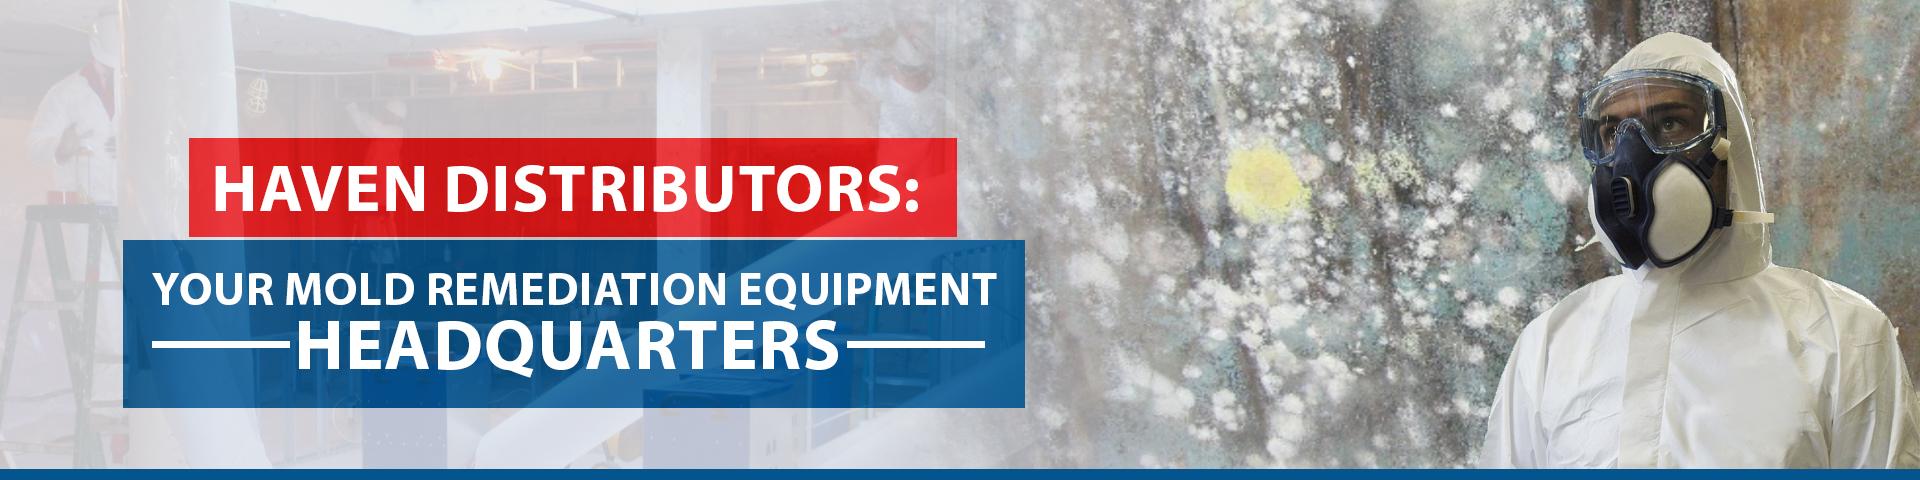 Haven Distributors – Equipment for Removing Mold Damage